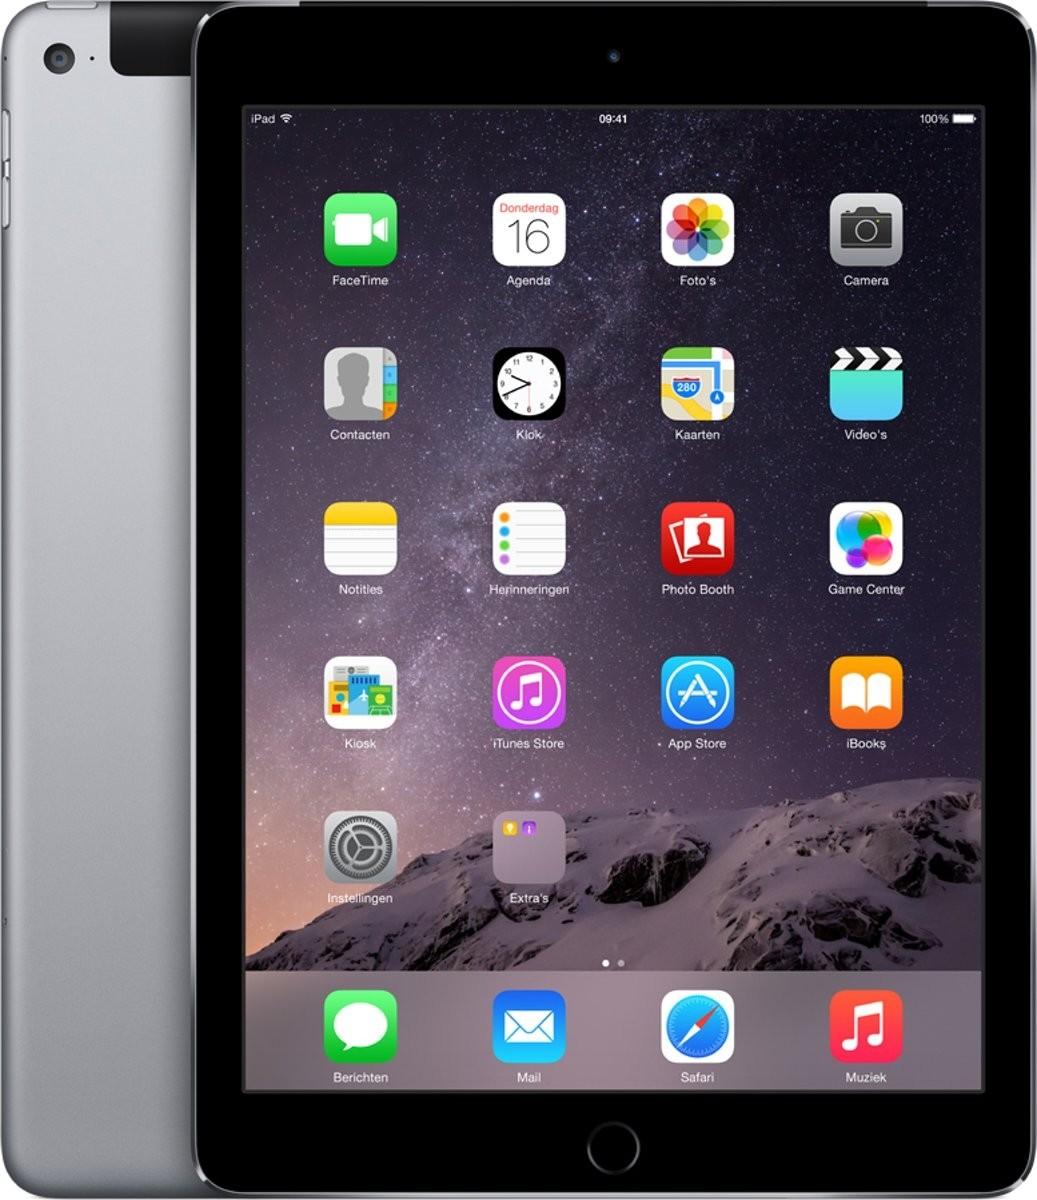 Apple iPad Air 2 - 64GB - 4G - Space Grey - (Retina Display) - A Grade Tweedehands